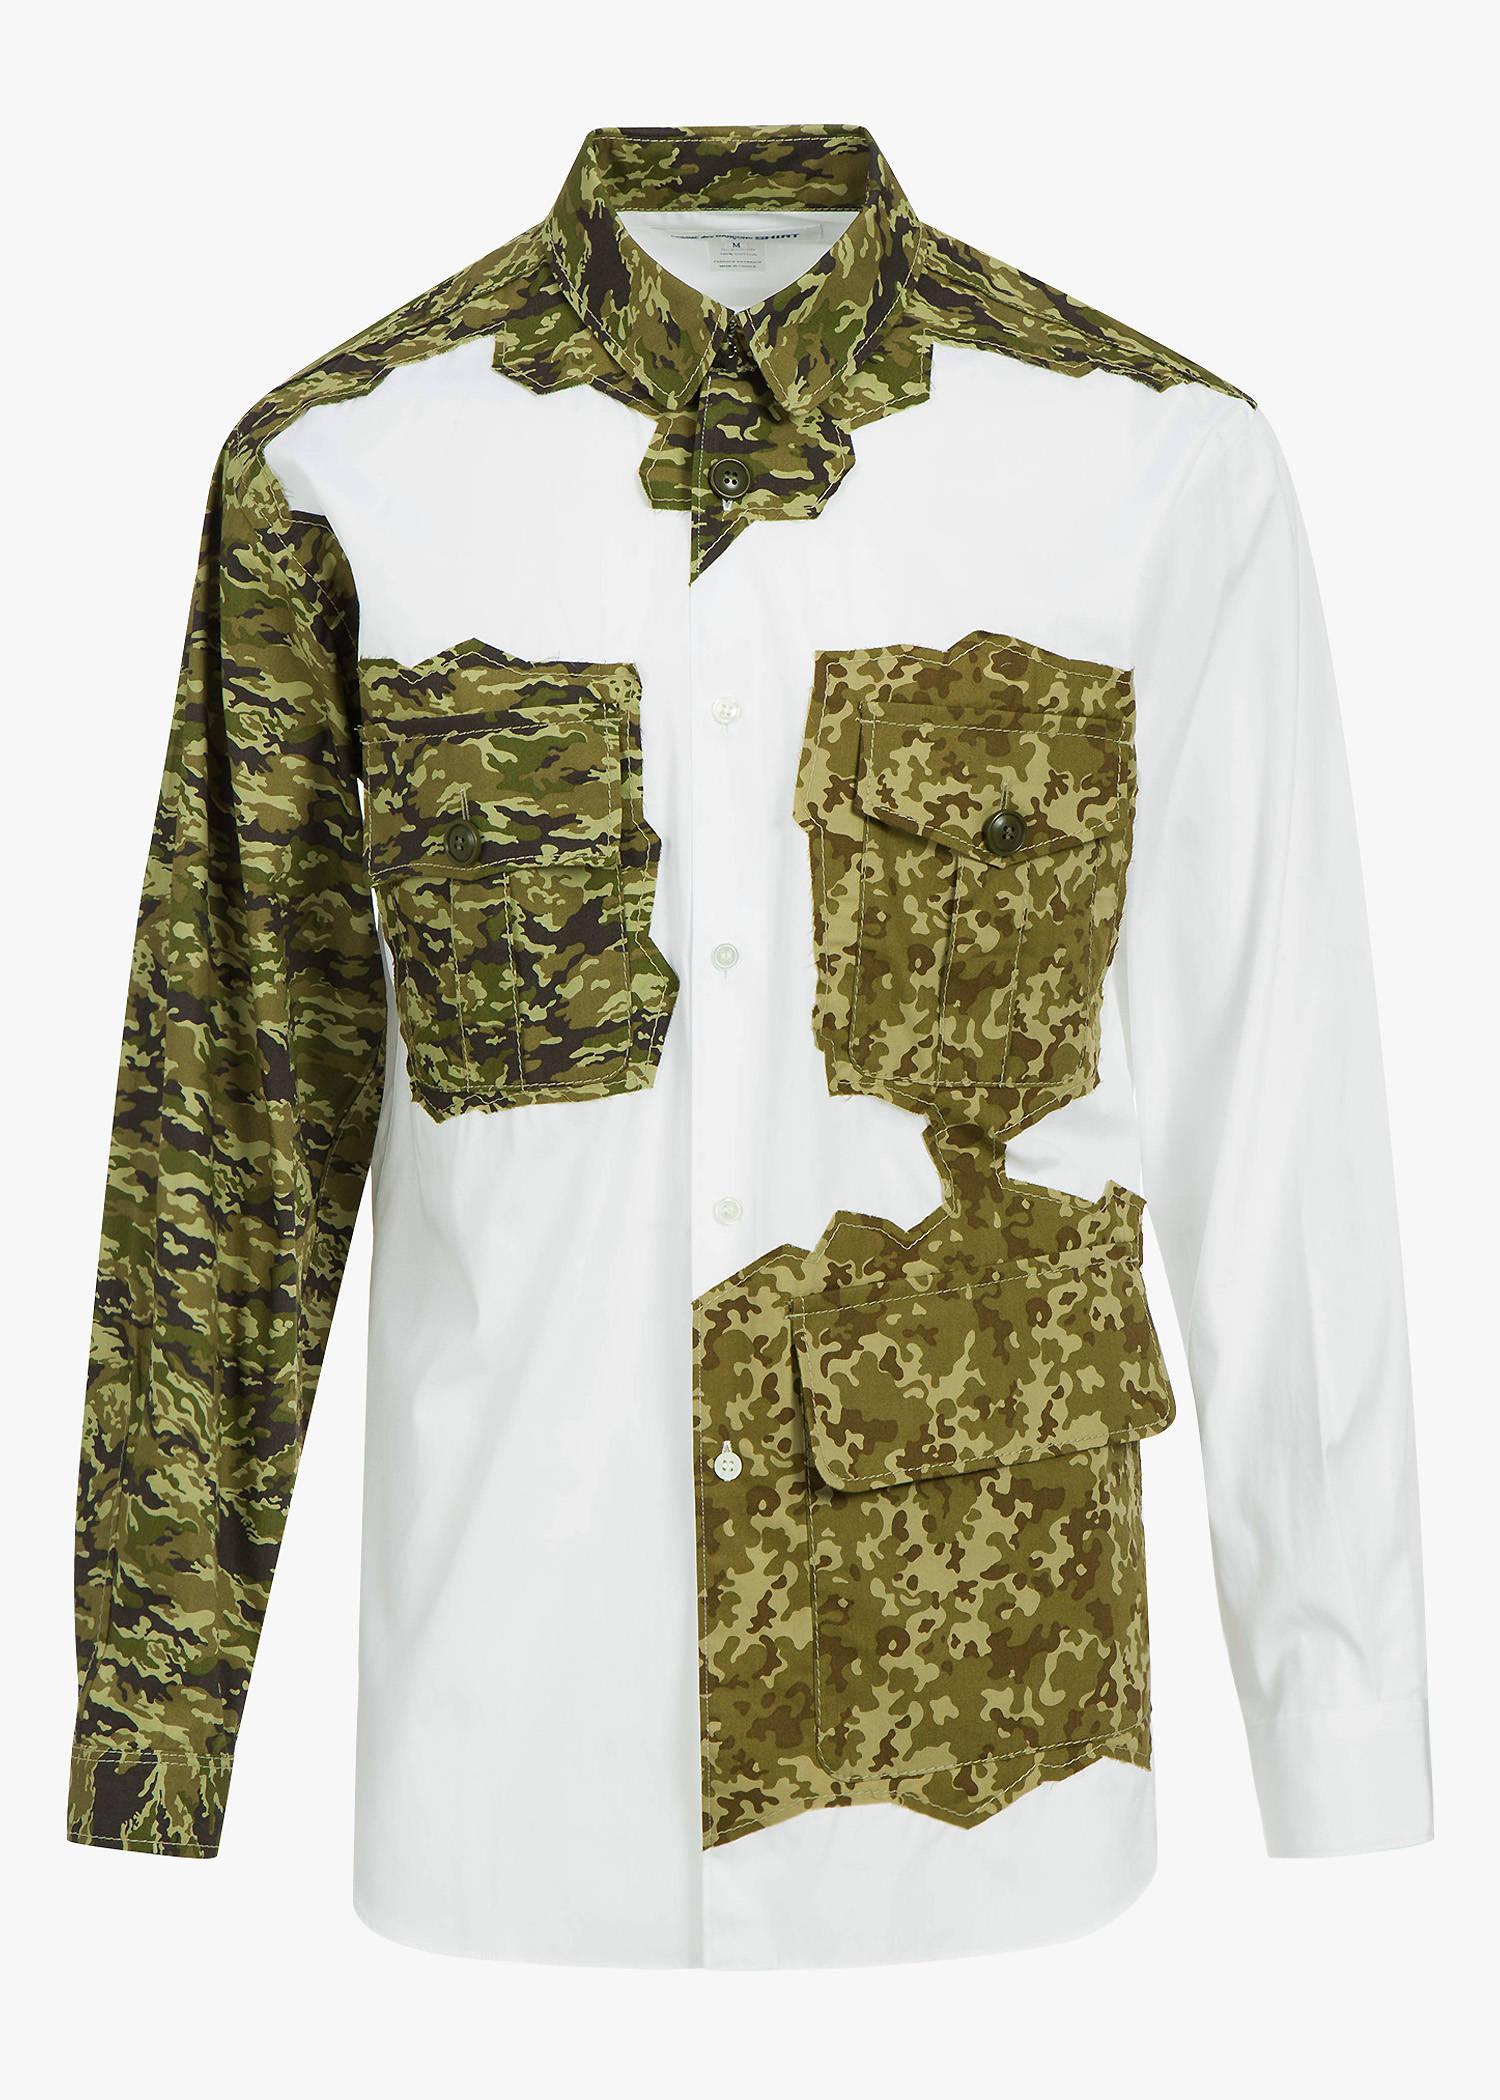 Comme Des GarÇOns Shirt Camo Patch Pocket Shirt In White/Camo